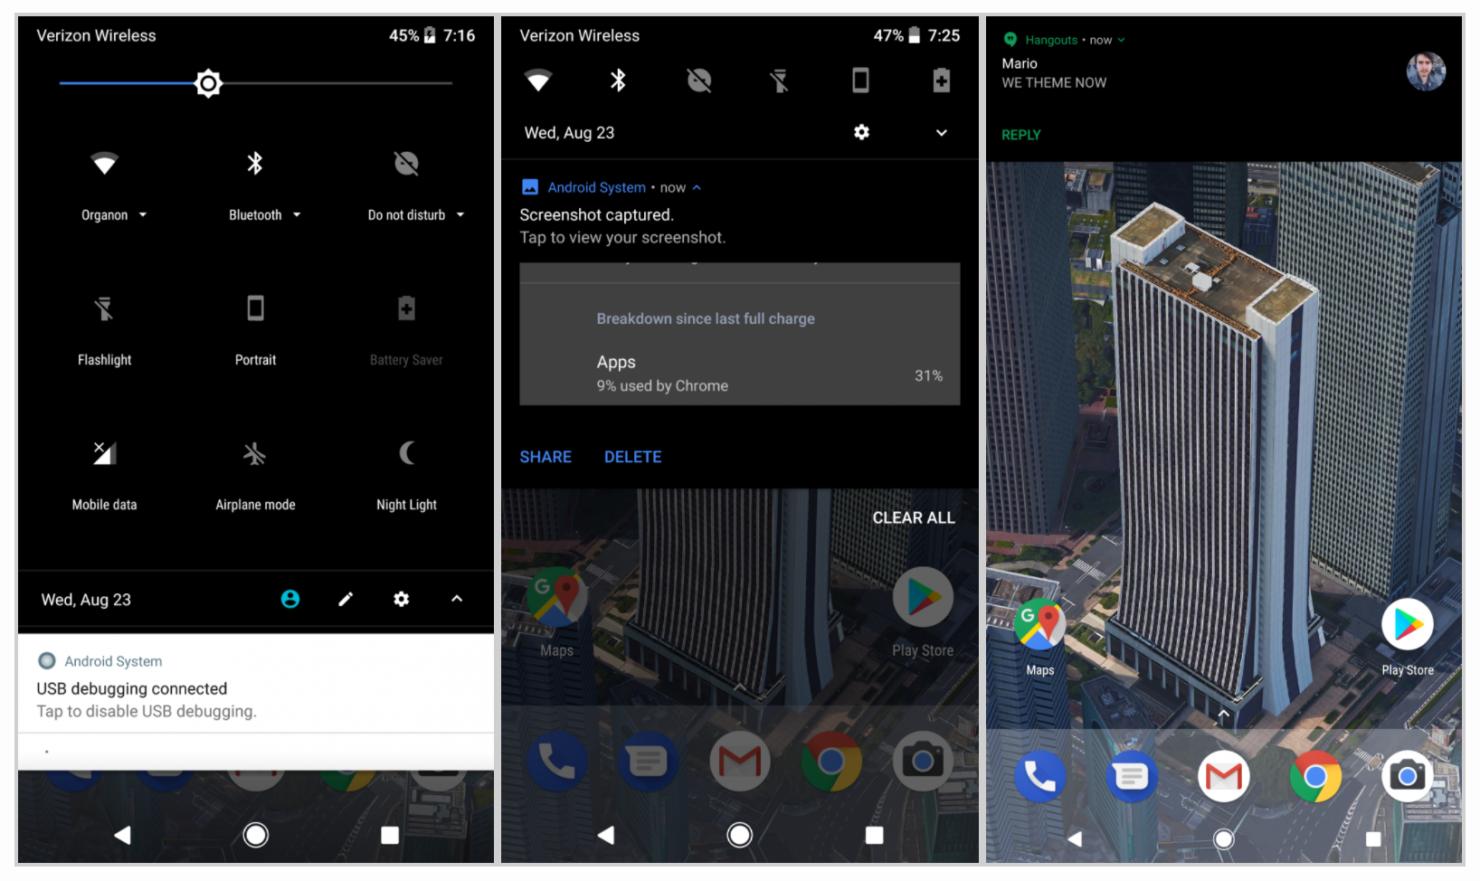 Substratum Android Oreo theme